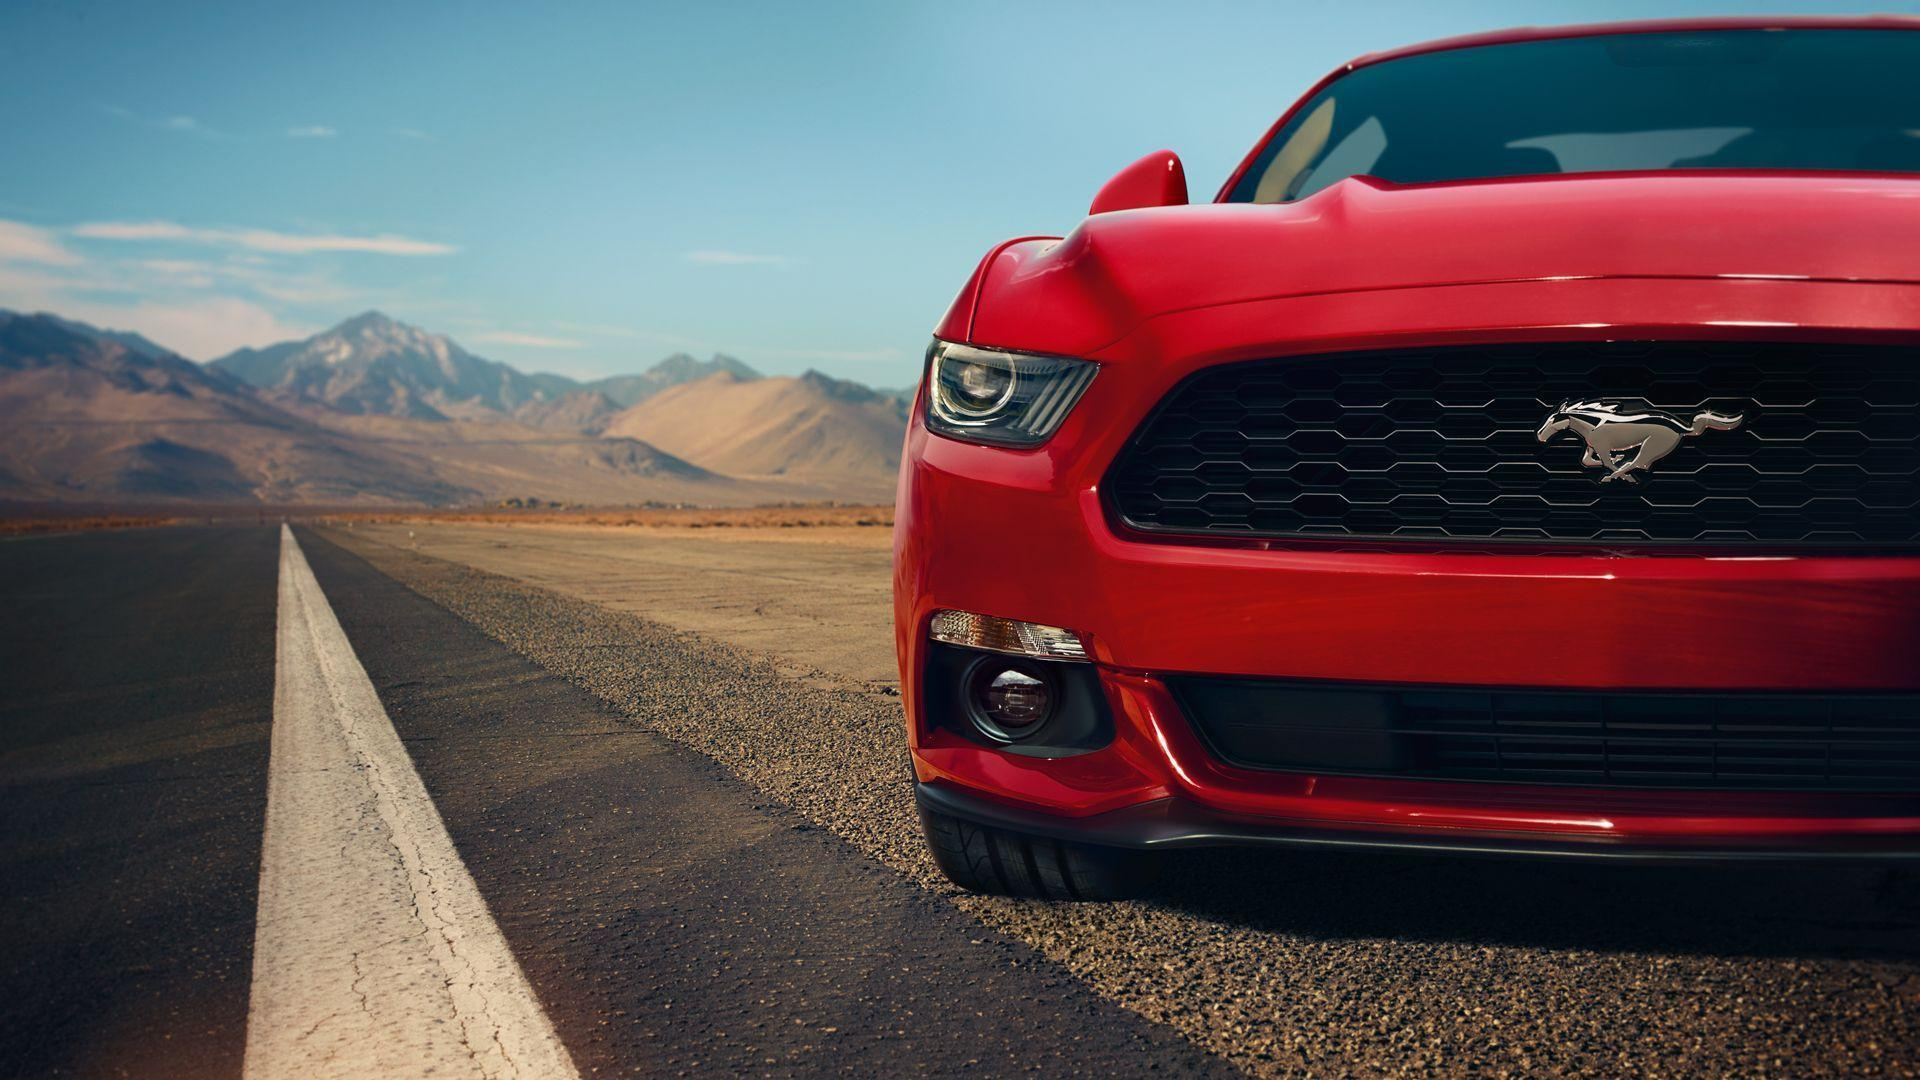 2016 Mustang Wallpapers 1920x1080